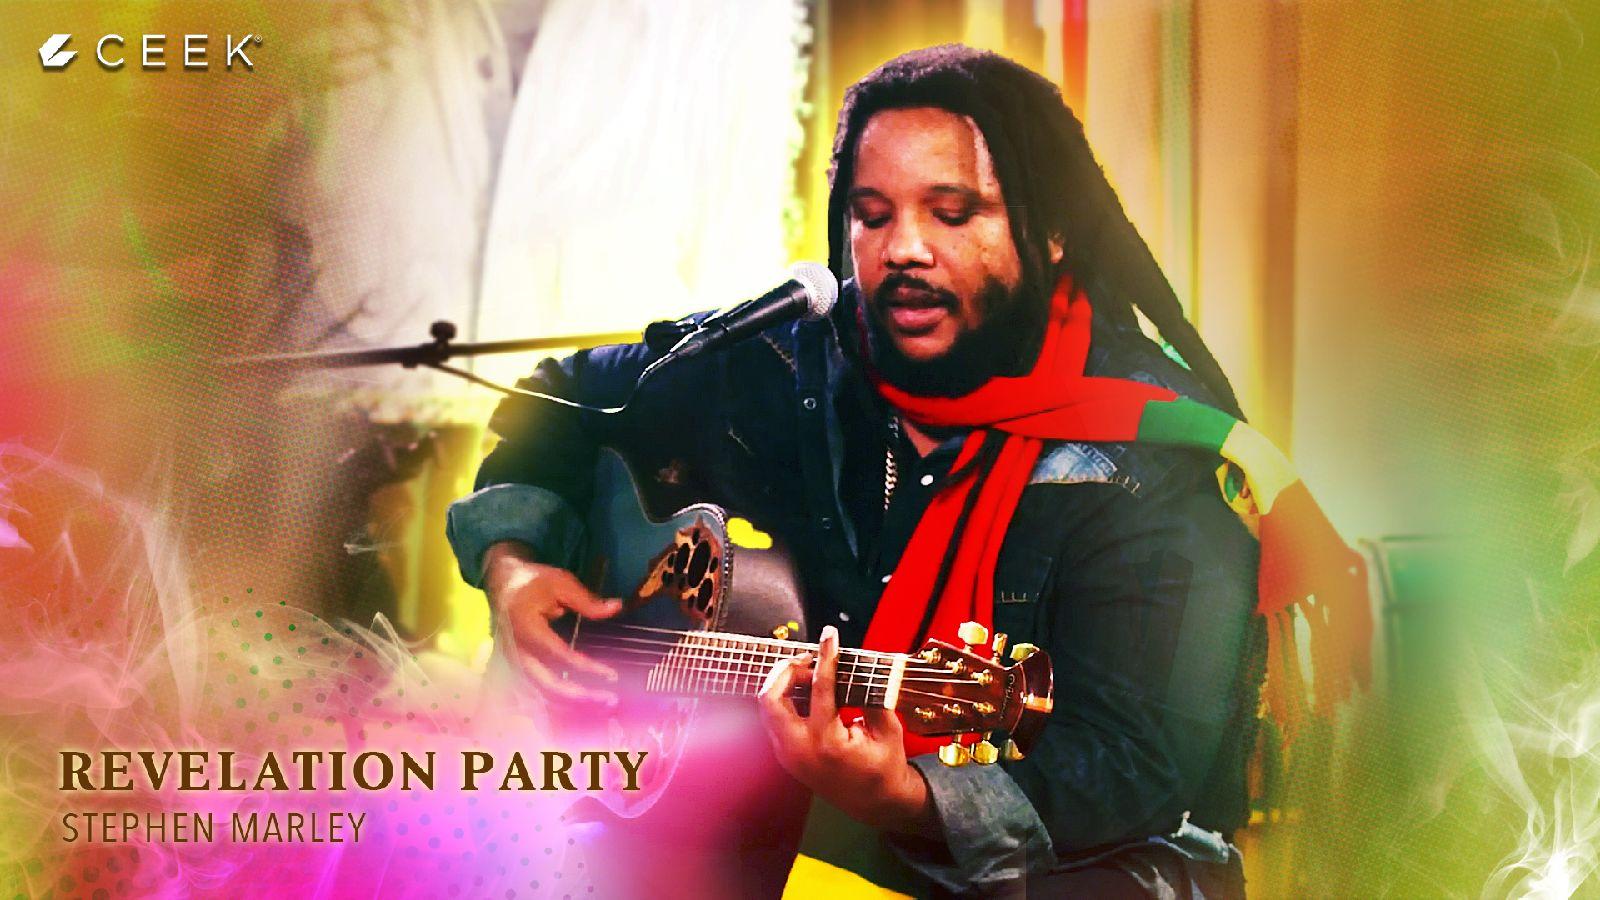 Revelation Party